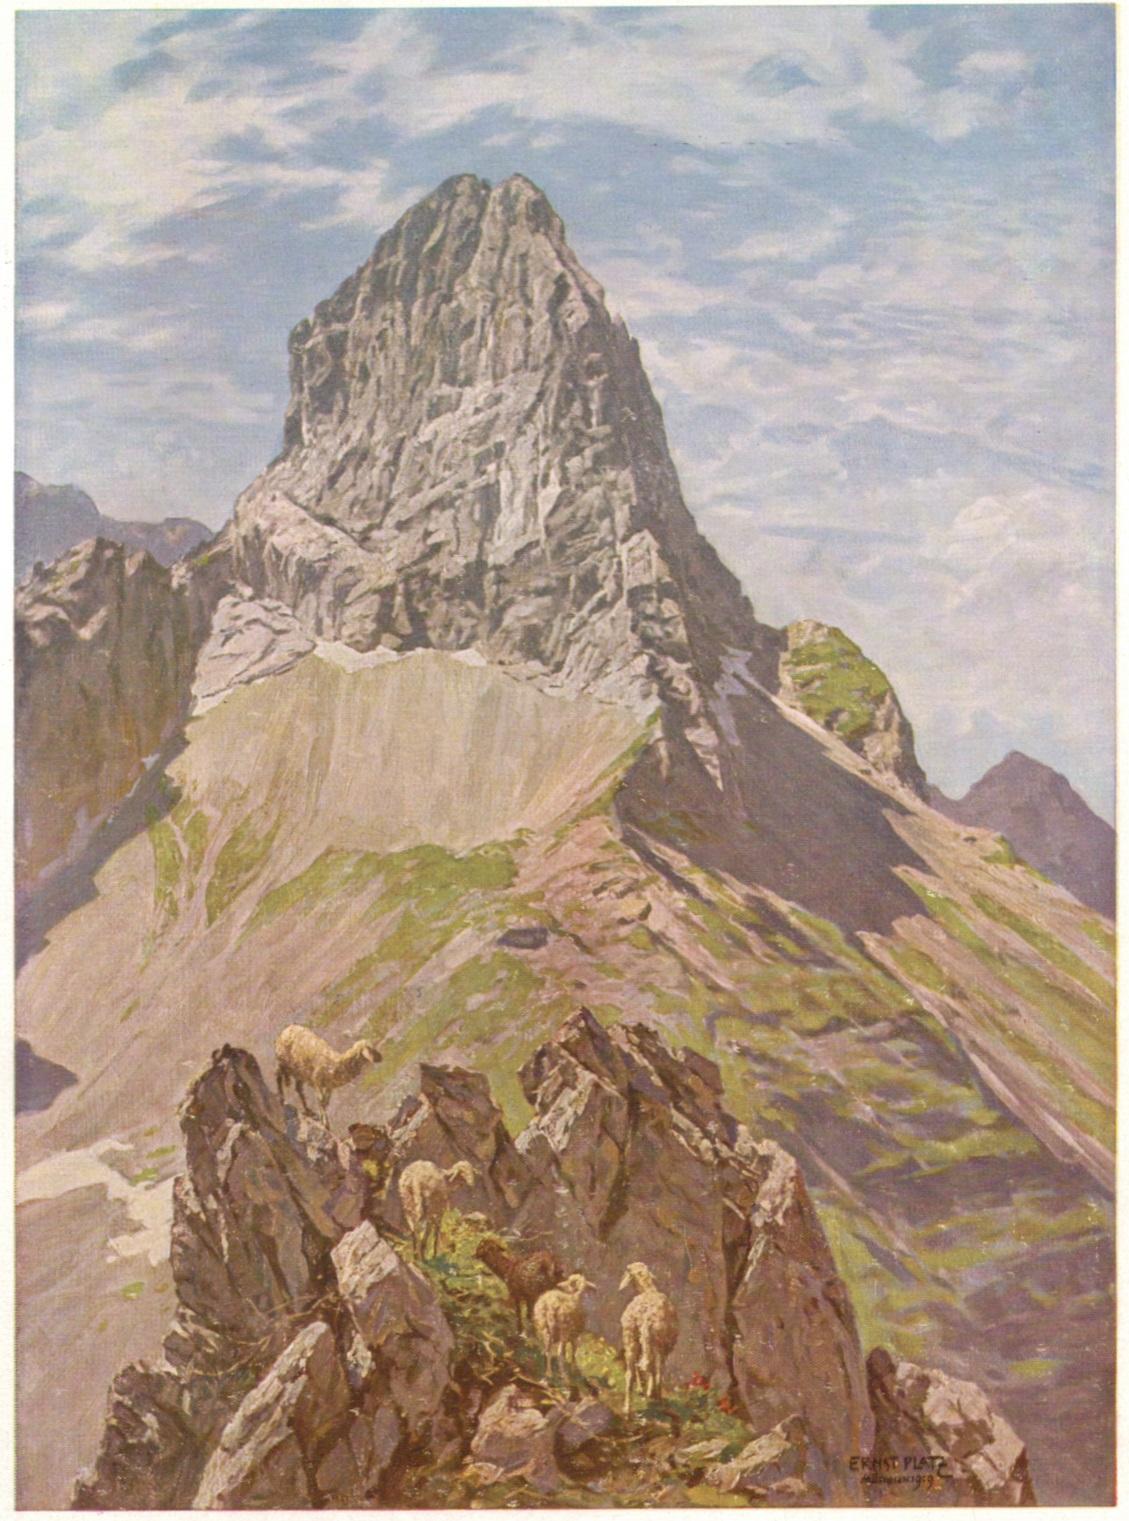 Ernst Platz - Foehnmorgen an der Lamsenspitze 1919p.jpg